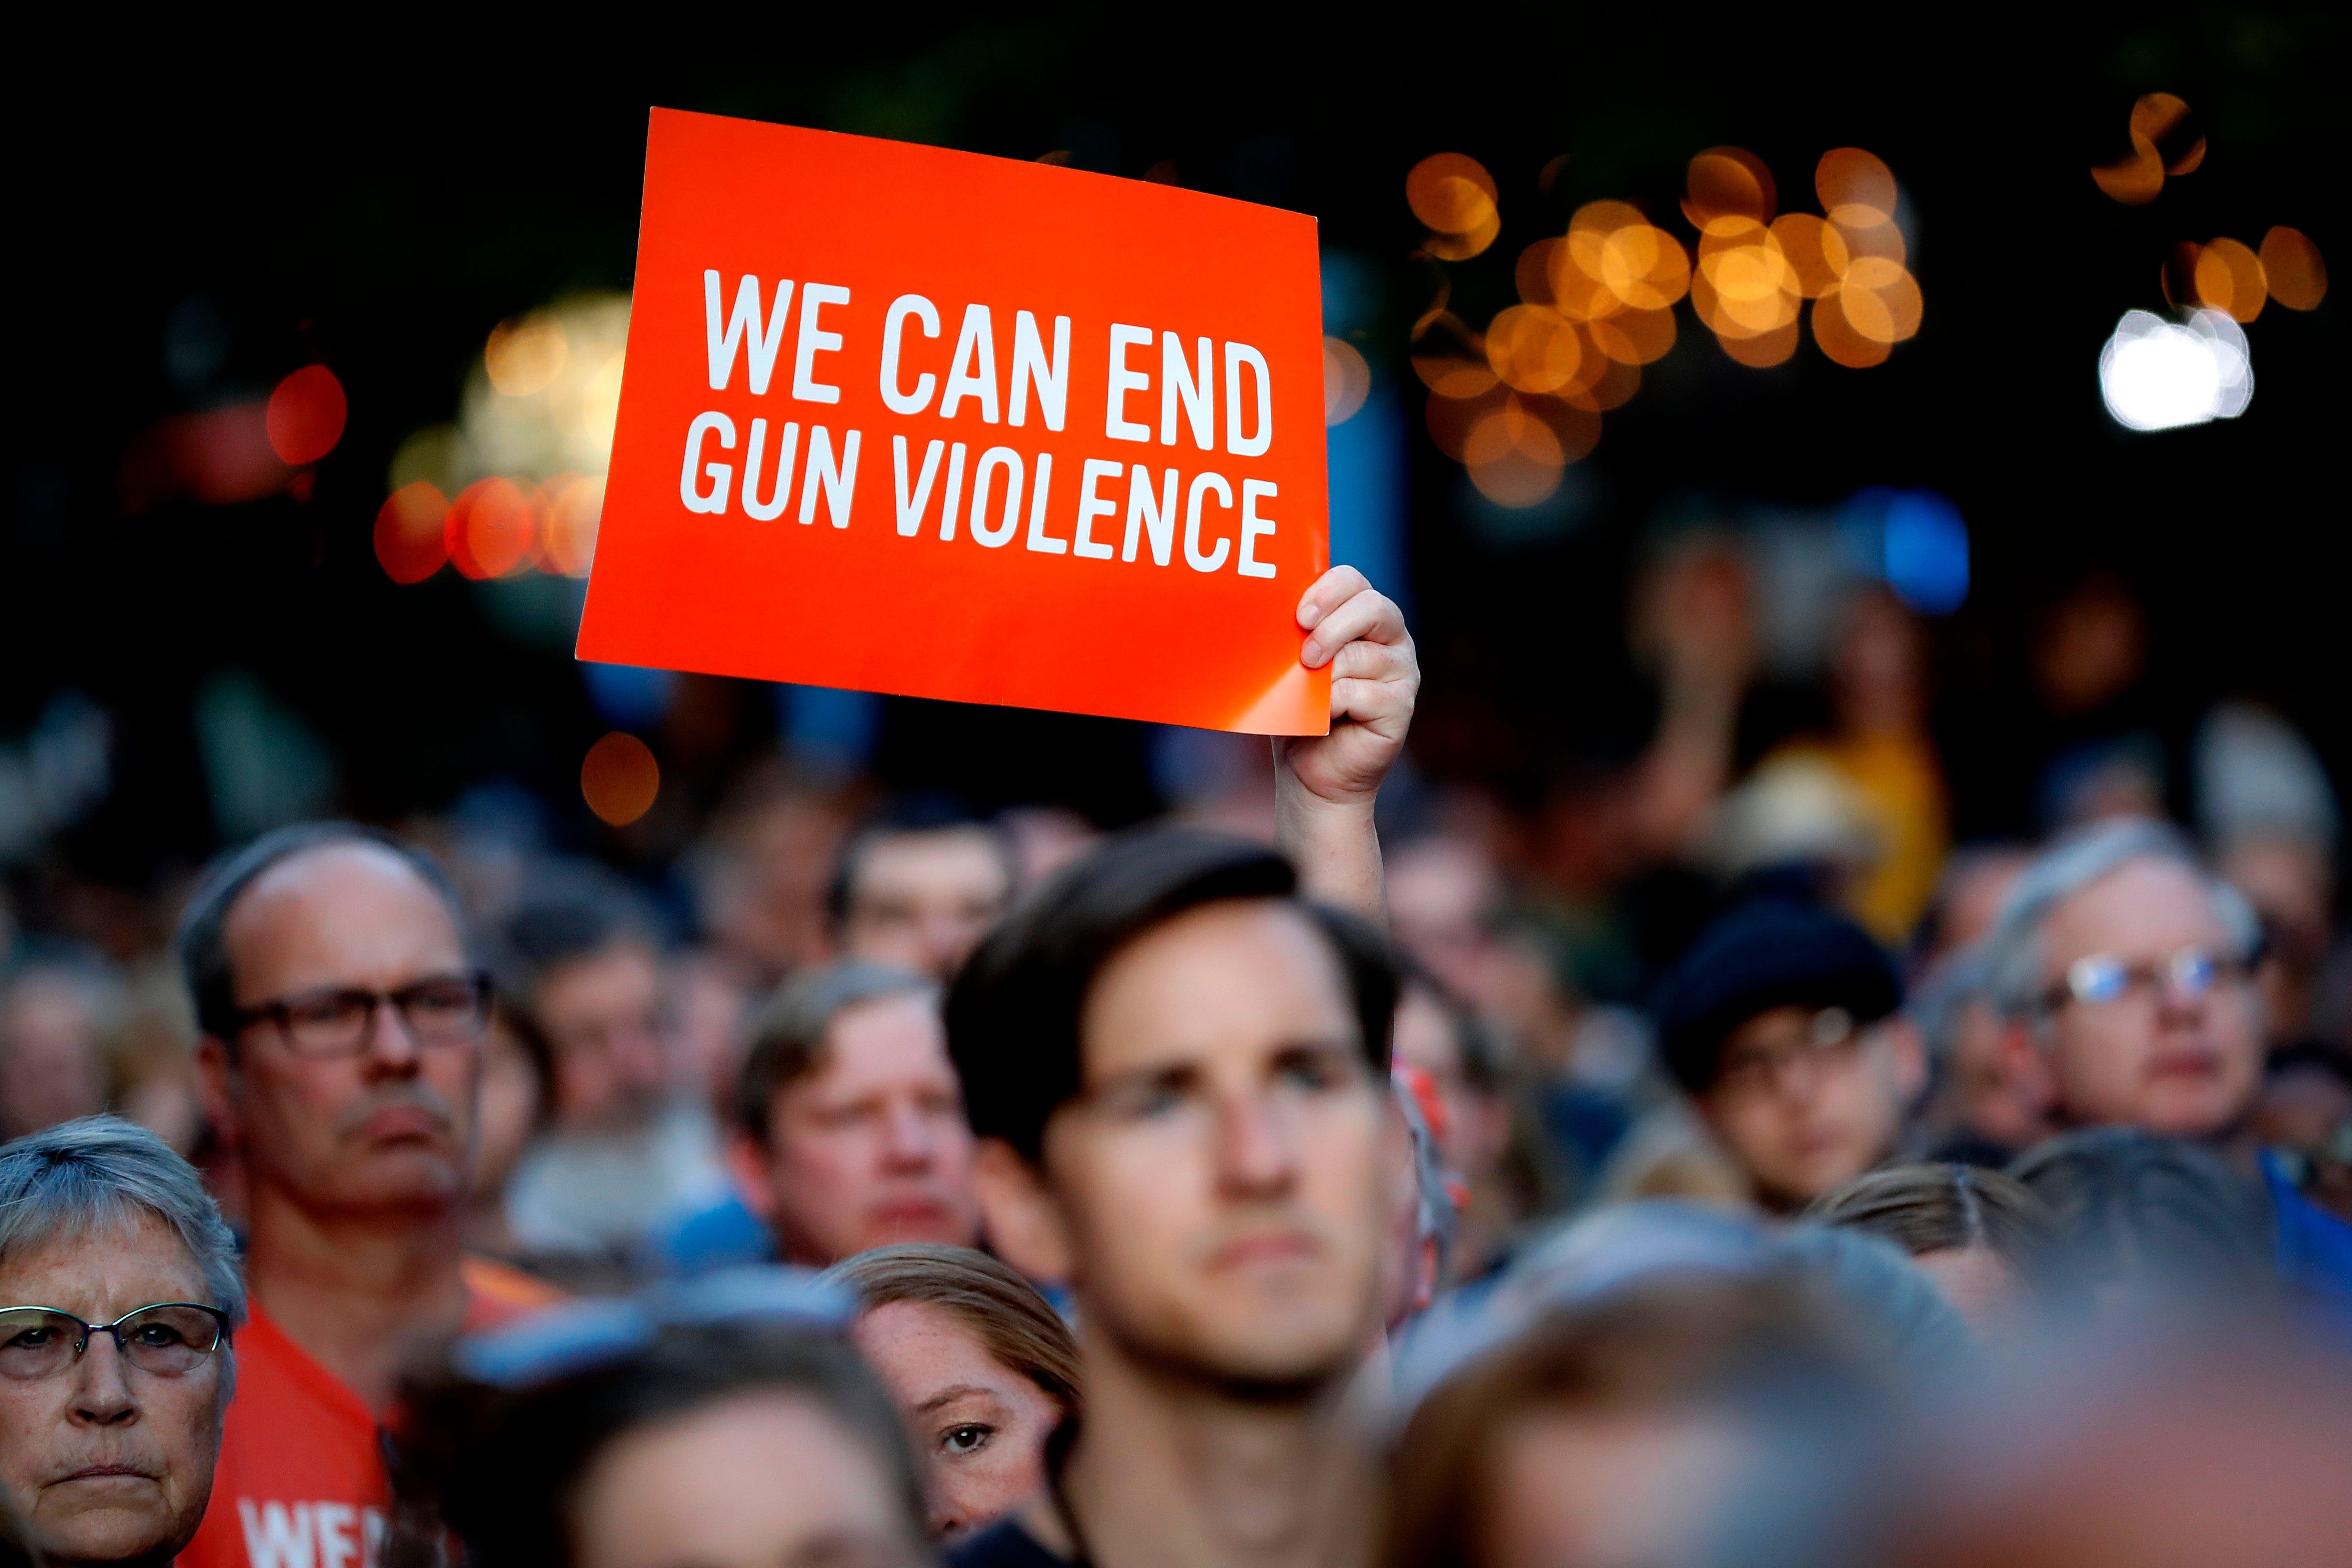 Shooting In Ohio El Paso Gilroy Shooters Had Links To Misogyny